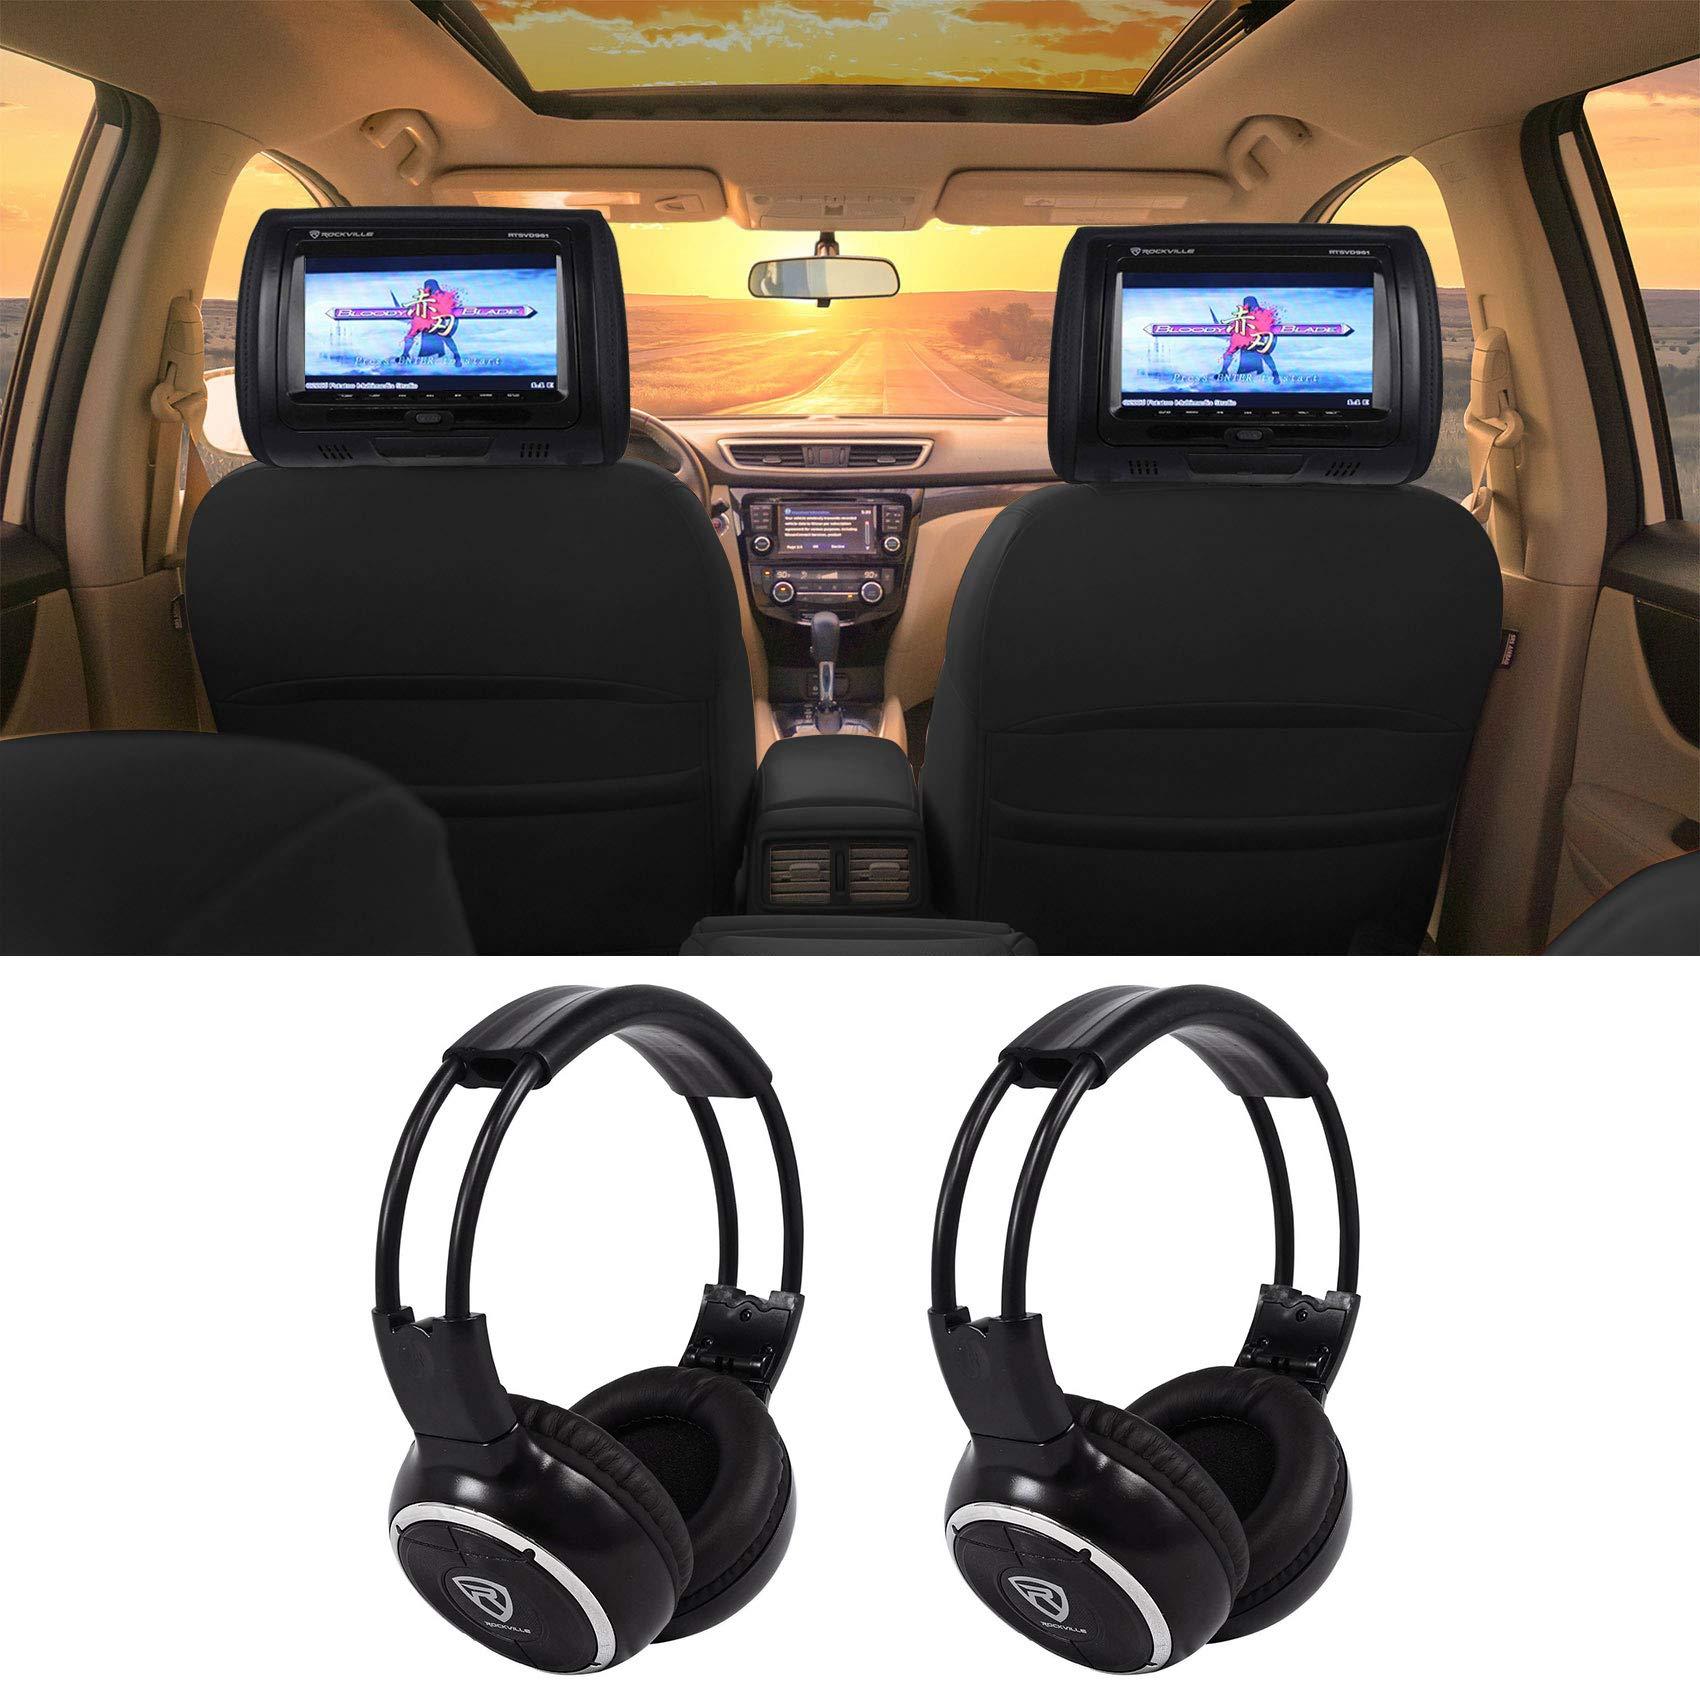 Rockville RTSVD961-BK 9 Black Touchscreen DVD/HDMI Headrest Monitors+Headphones by Rockville